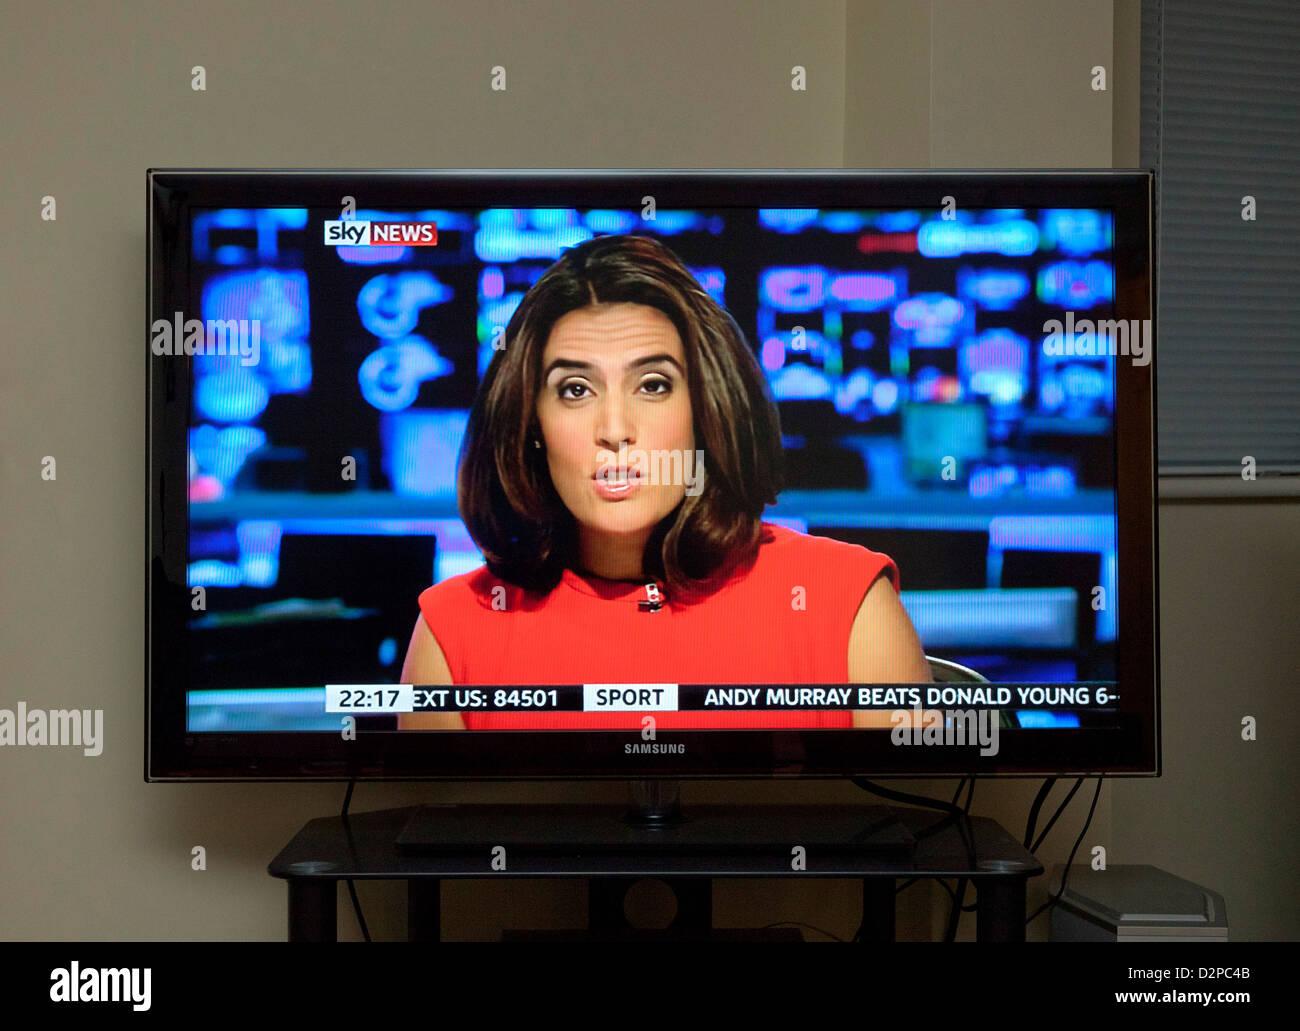 sky news channel on tv stock photo 53352891 alamy